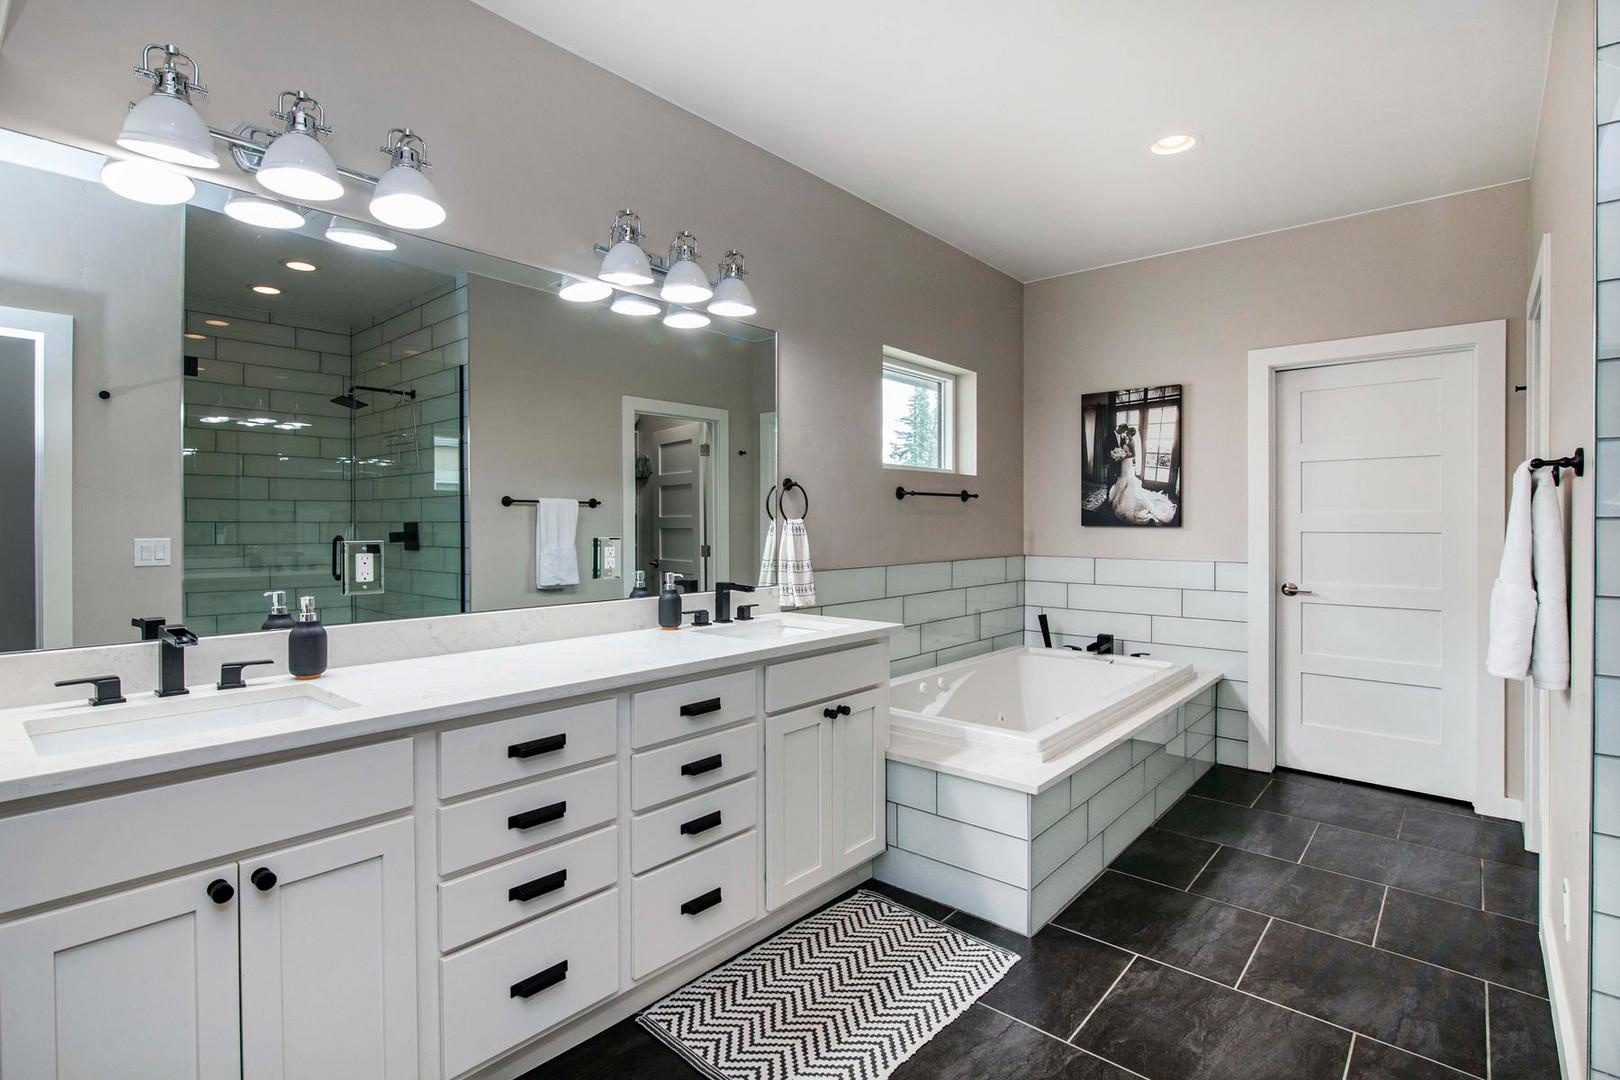 4404 Wolff Street-036-039-Bathroom-MLS_S